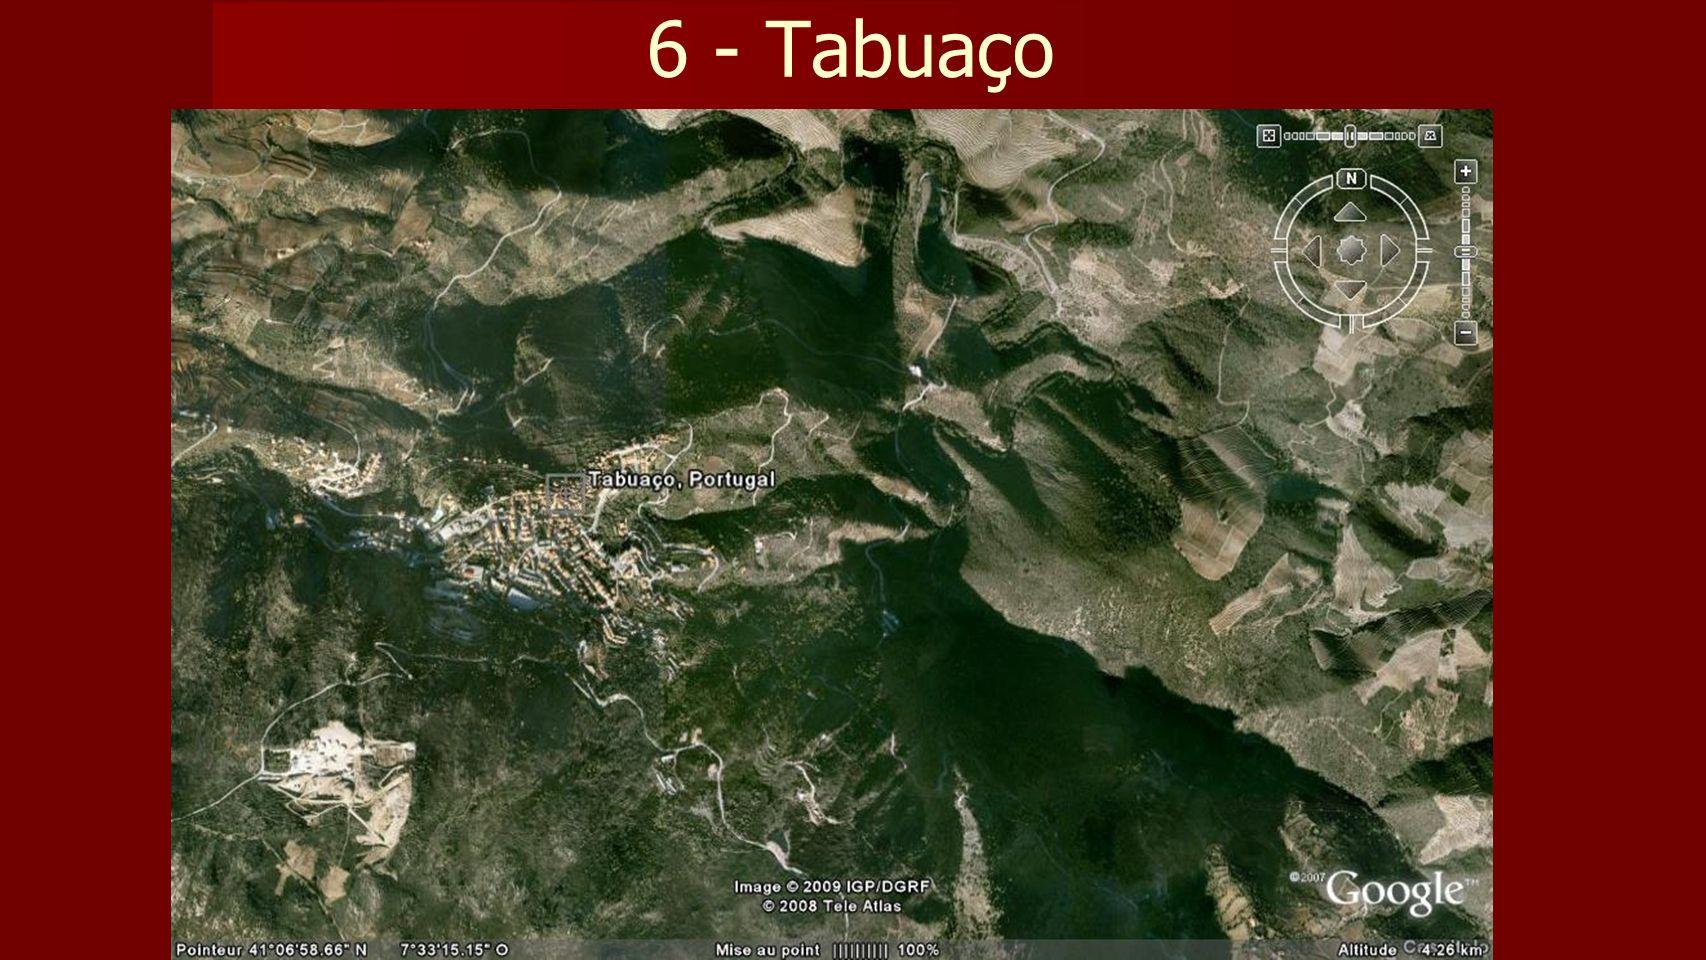 6 - Tabuaço